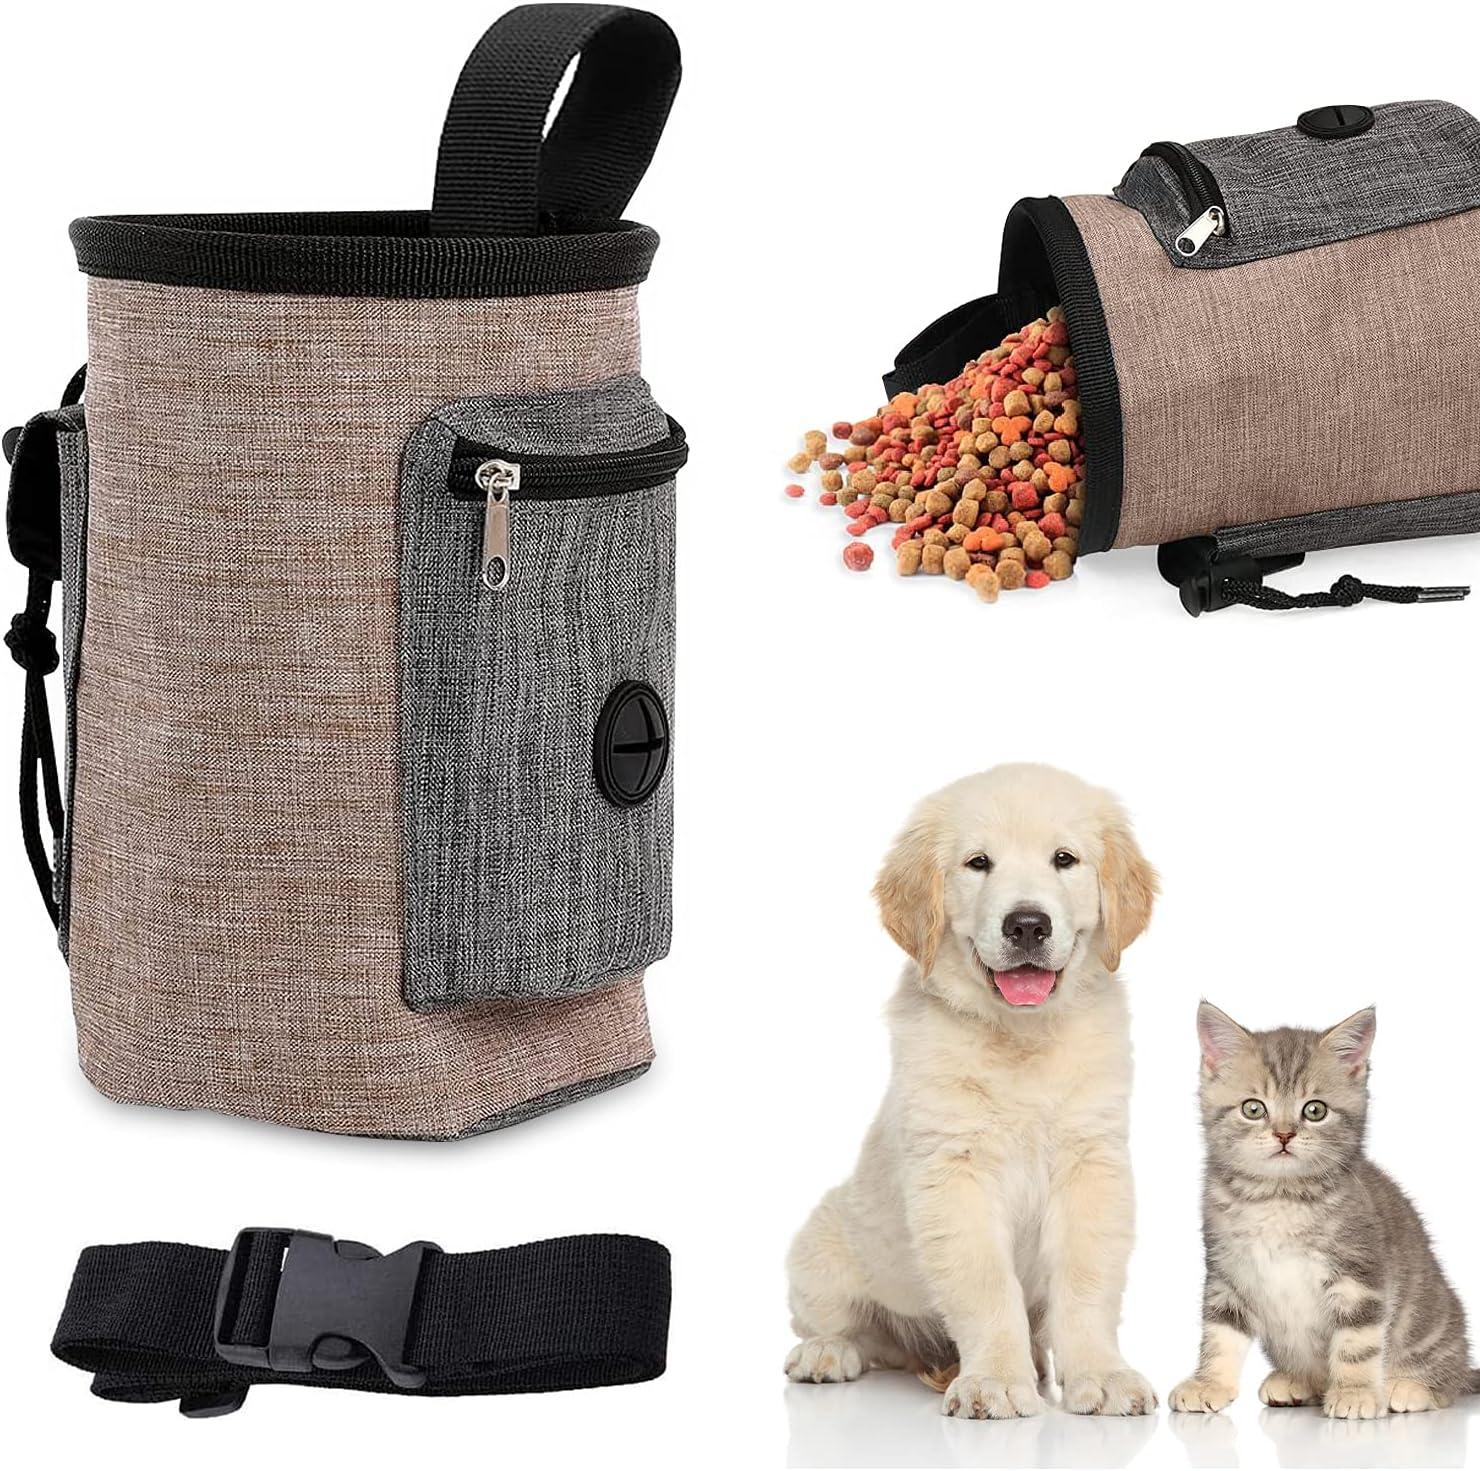 WELLXUNK Bolsa de Cintura Mascota Perro, Bolsas de Golosinas para Perros, Bolsa de Entrenamiento para Perros, Manos Libre Bolsa para Perros Comida, Bolsa para Aperitivos para Perros (M1)